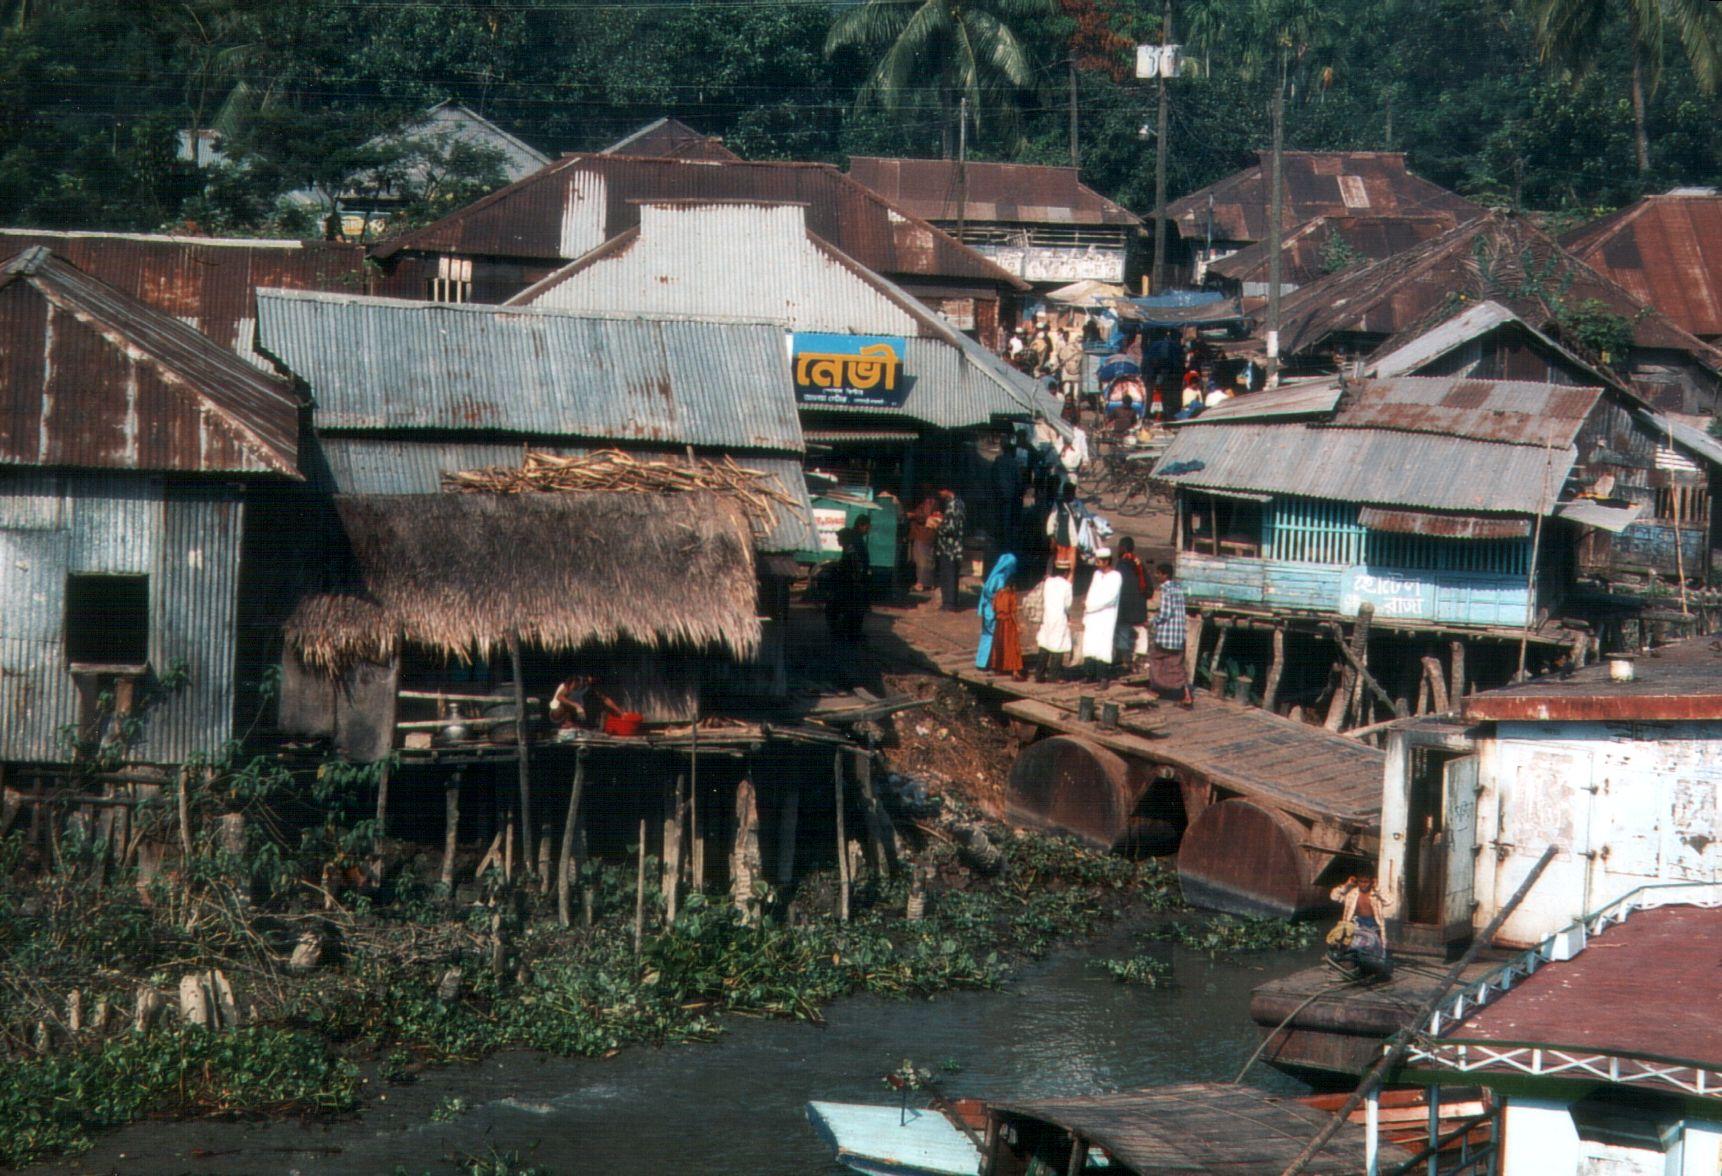 File Bangladesh Barisal Shanty Town Slum Next To River